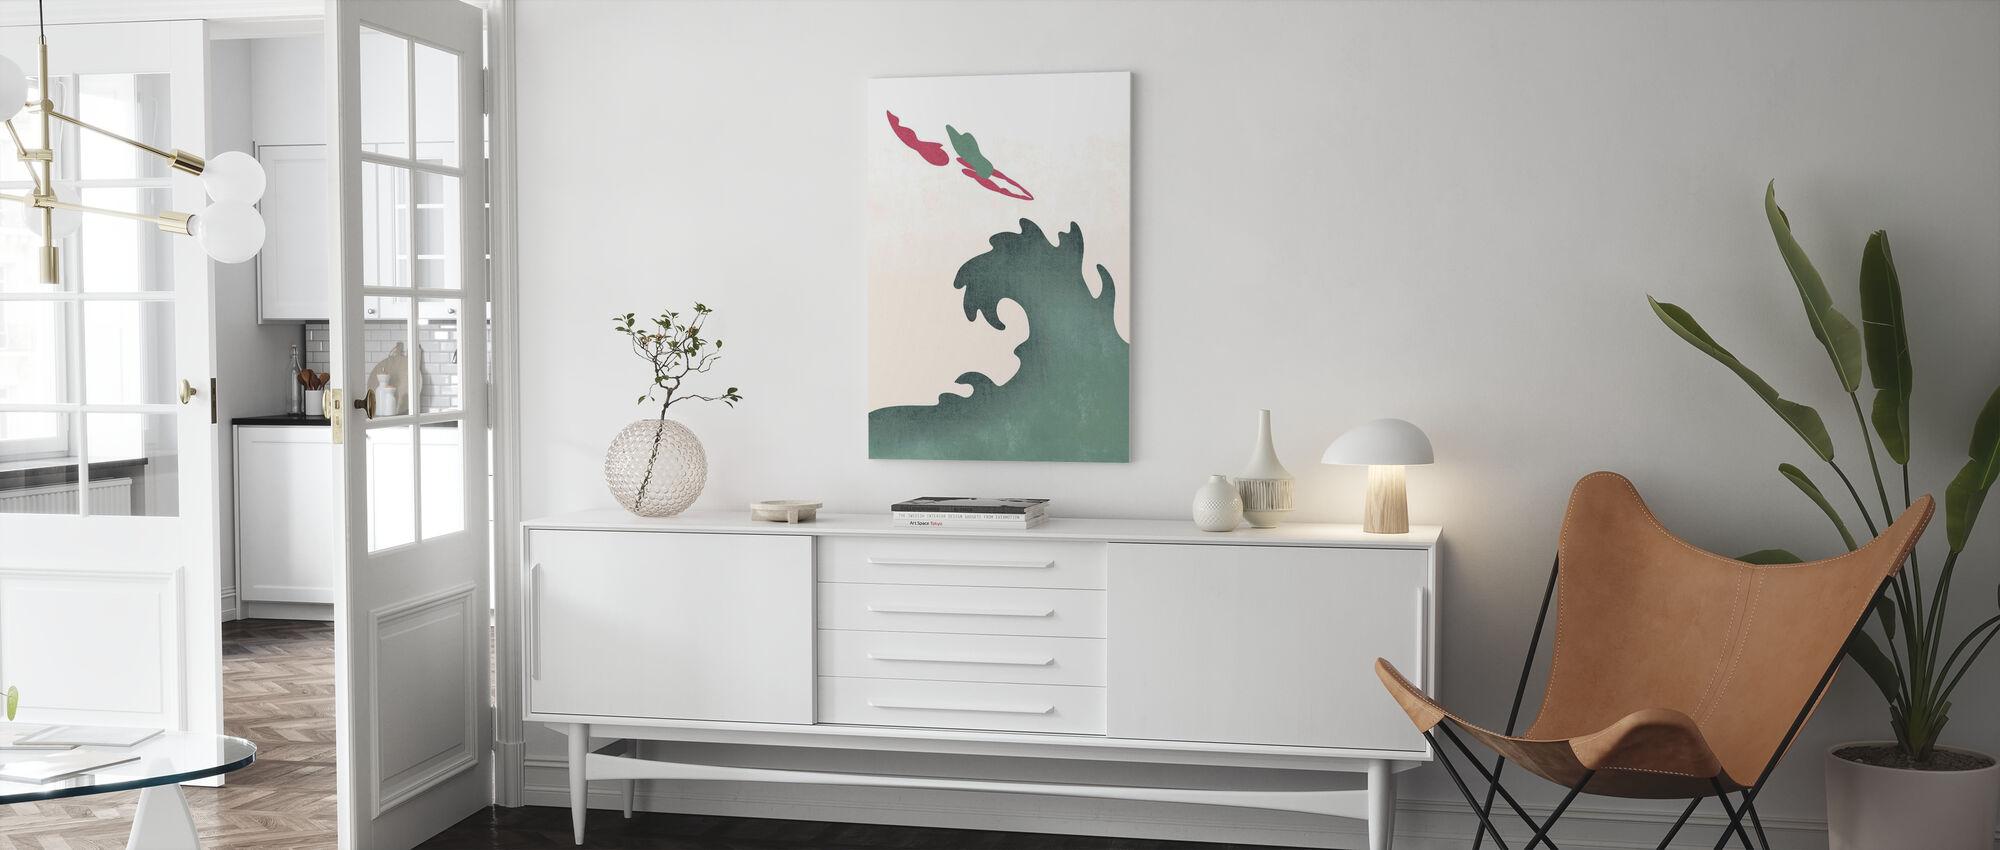 Heilige Duiker - Groen - Canvas print - Woonkamer